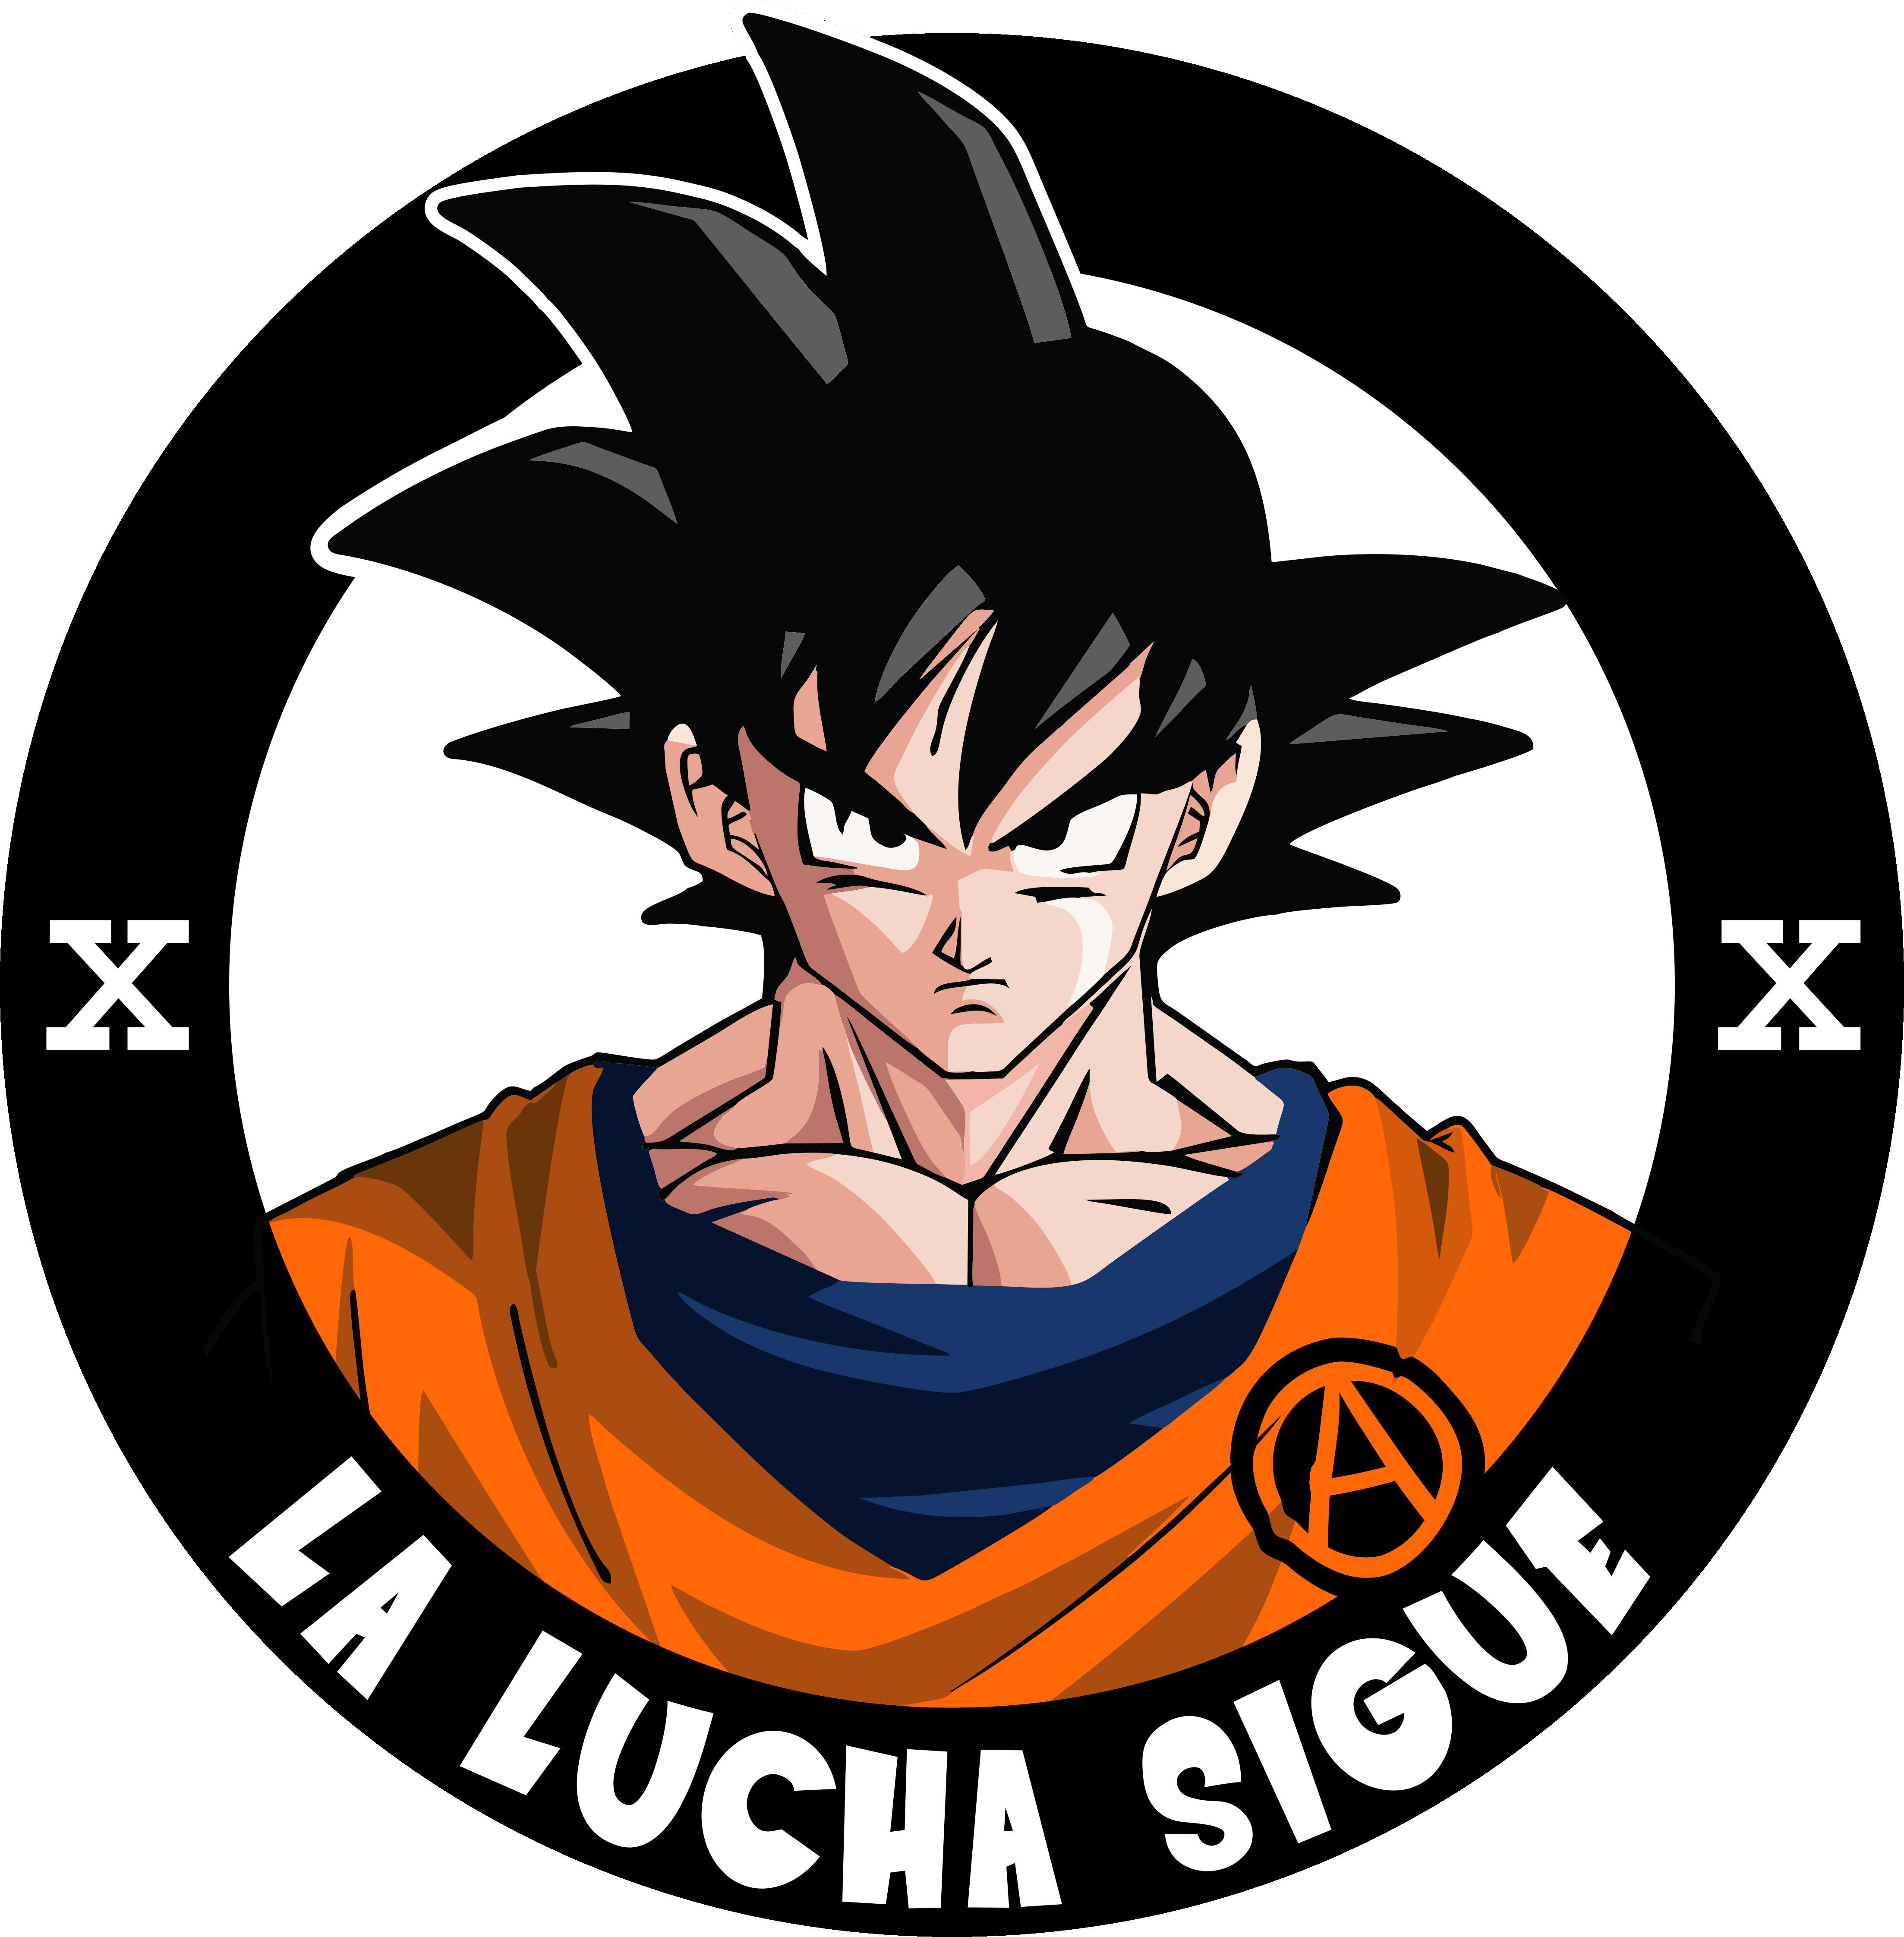 Goku Vive, La Lucha Sigue - Funny Dragon Ball Z Memes (4412x4489), Png Download